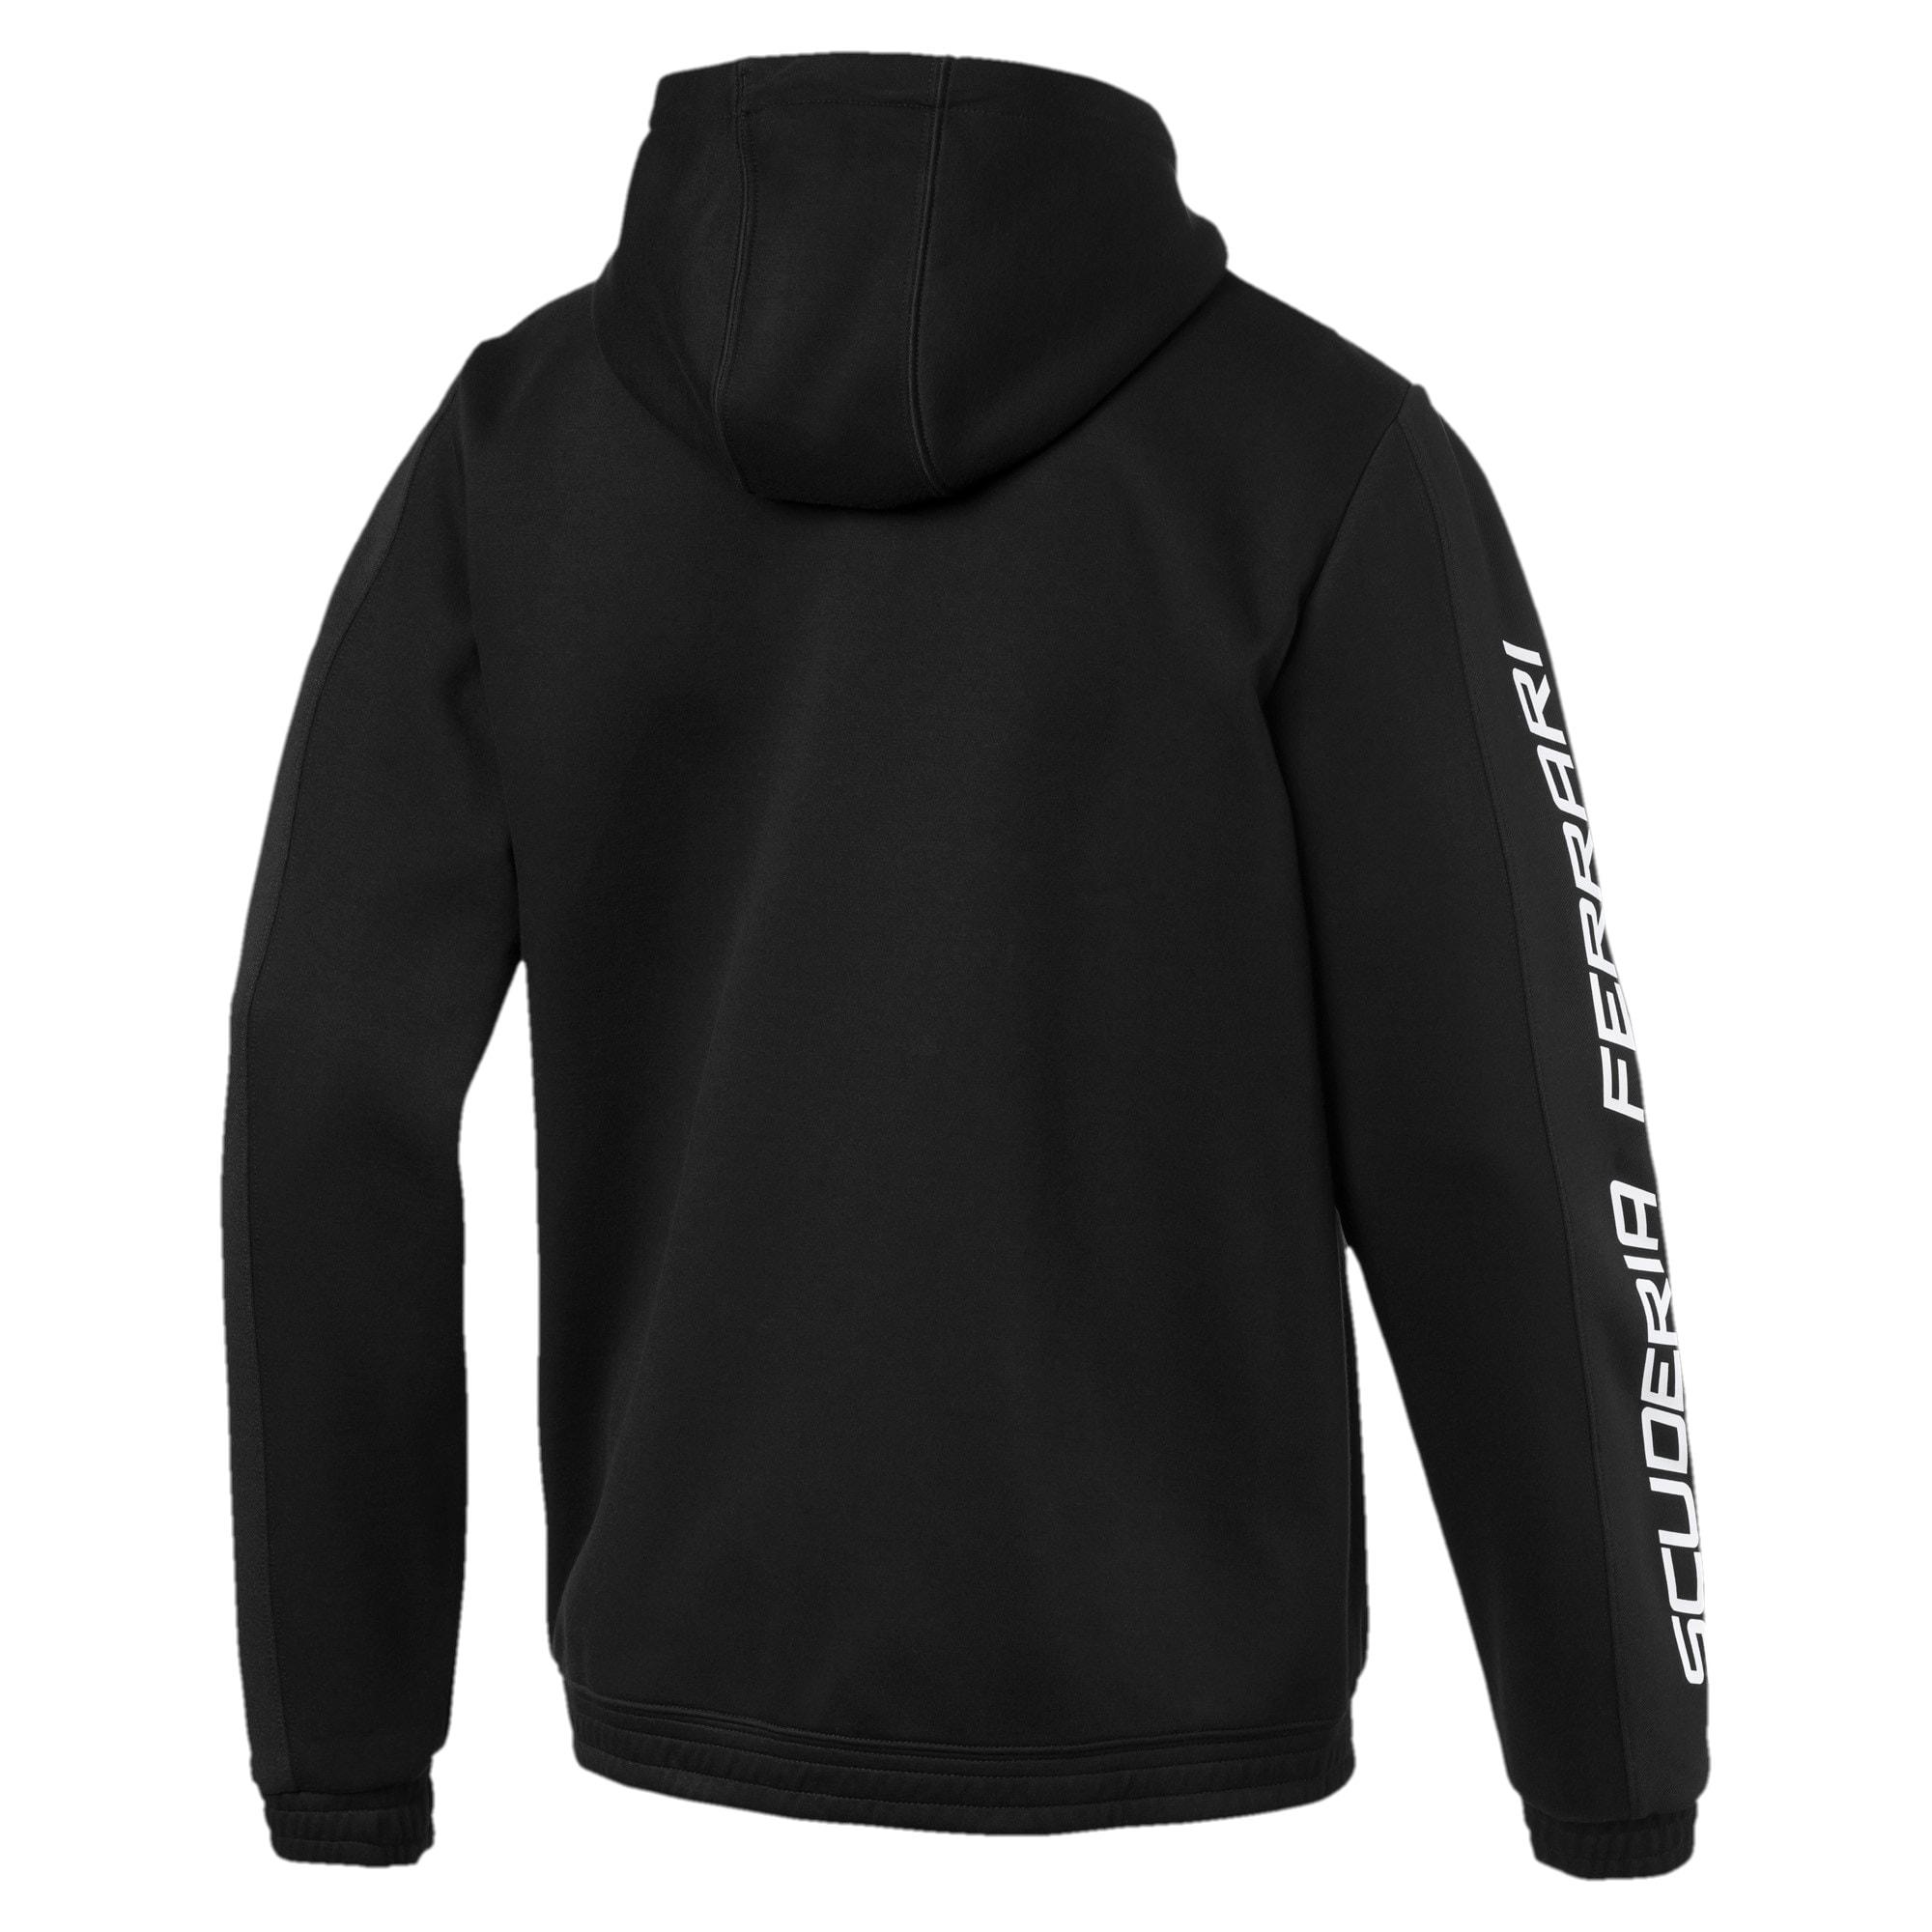 Thumbnail 2 of Scuderia Ferrari Men's Hooded Sweat Jacket, Puma Black, medium